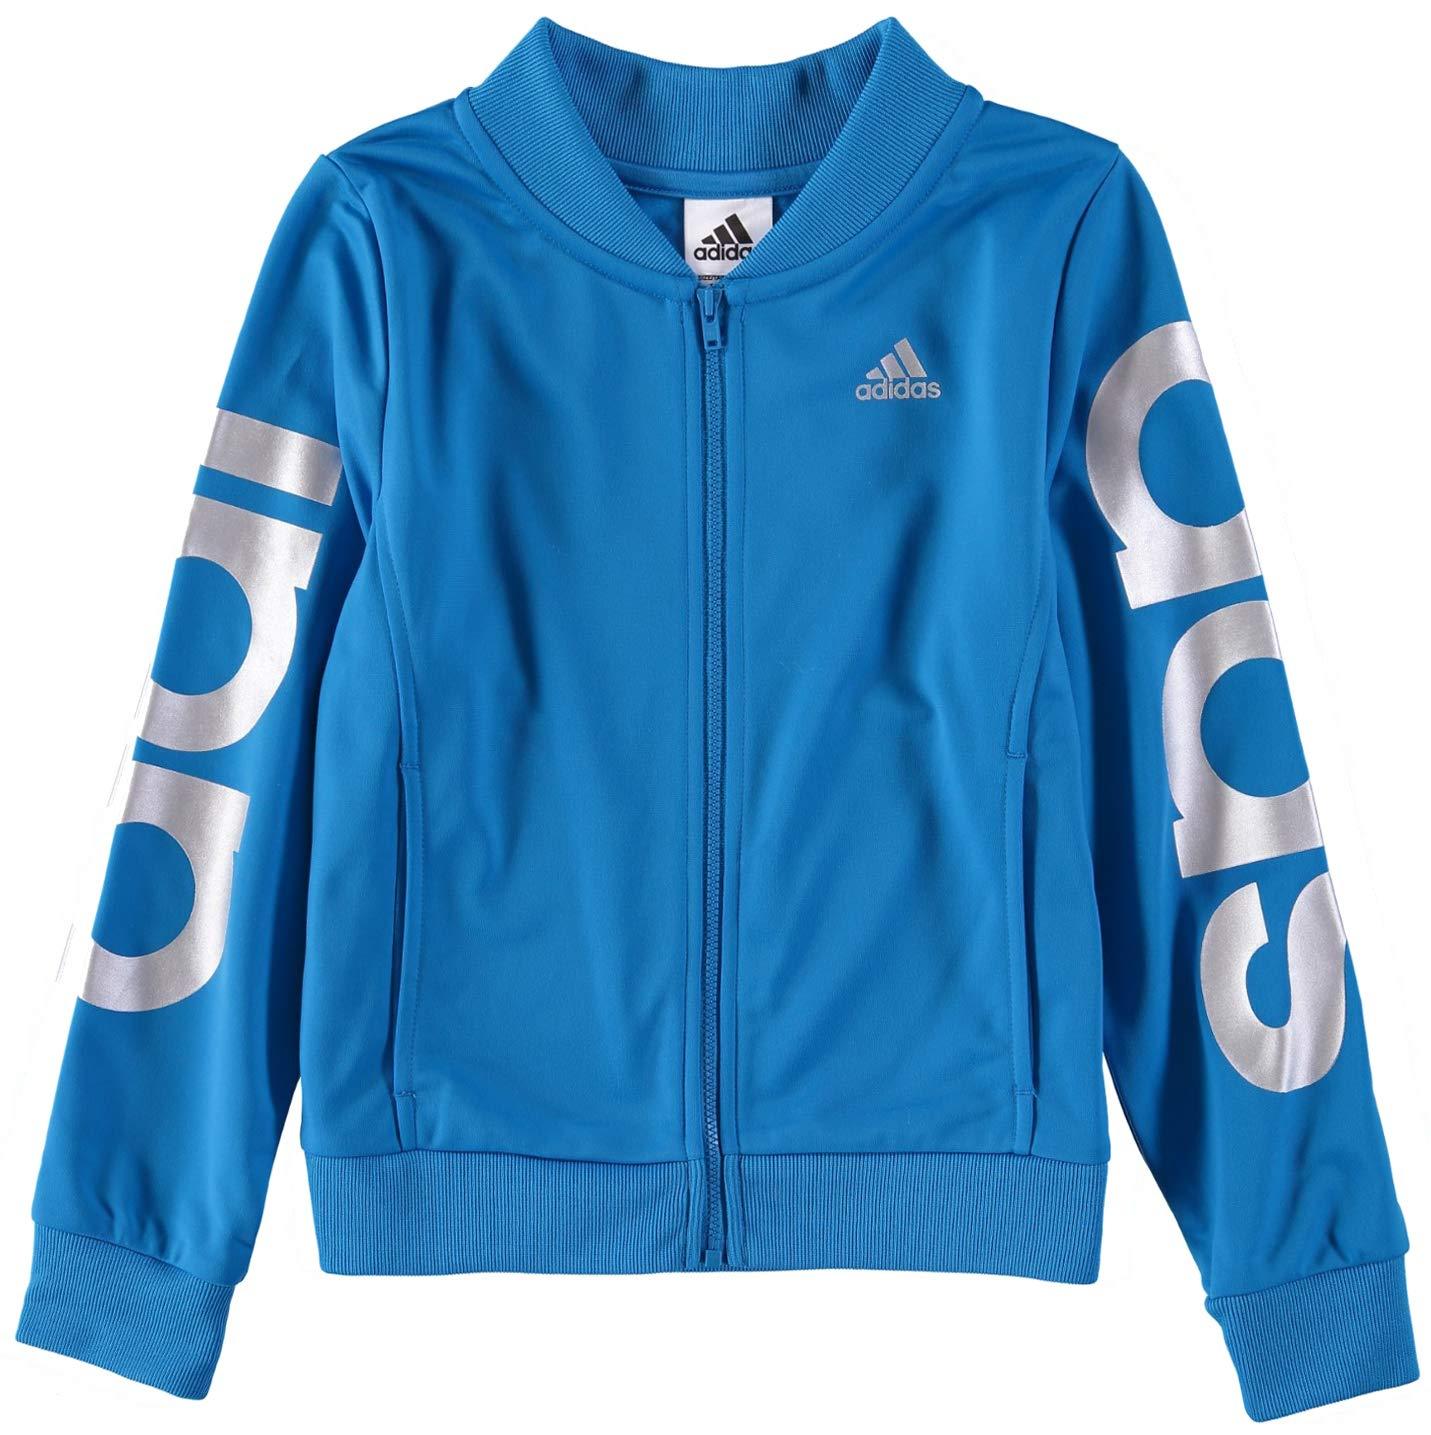 adidas Girls' Track Jacket (S (7/8), Bright Blue) by adidas